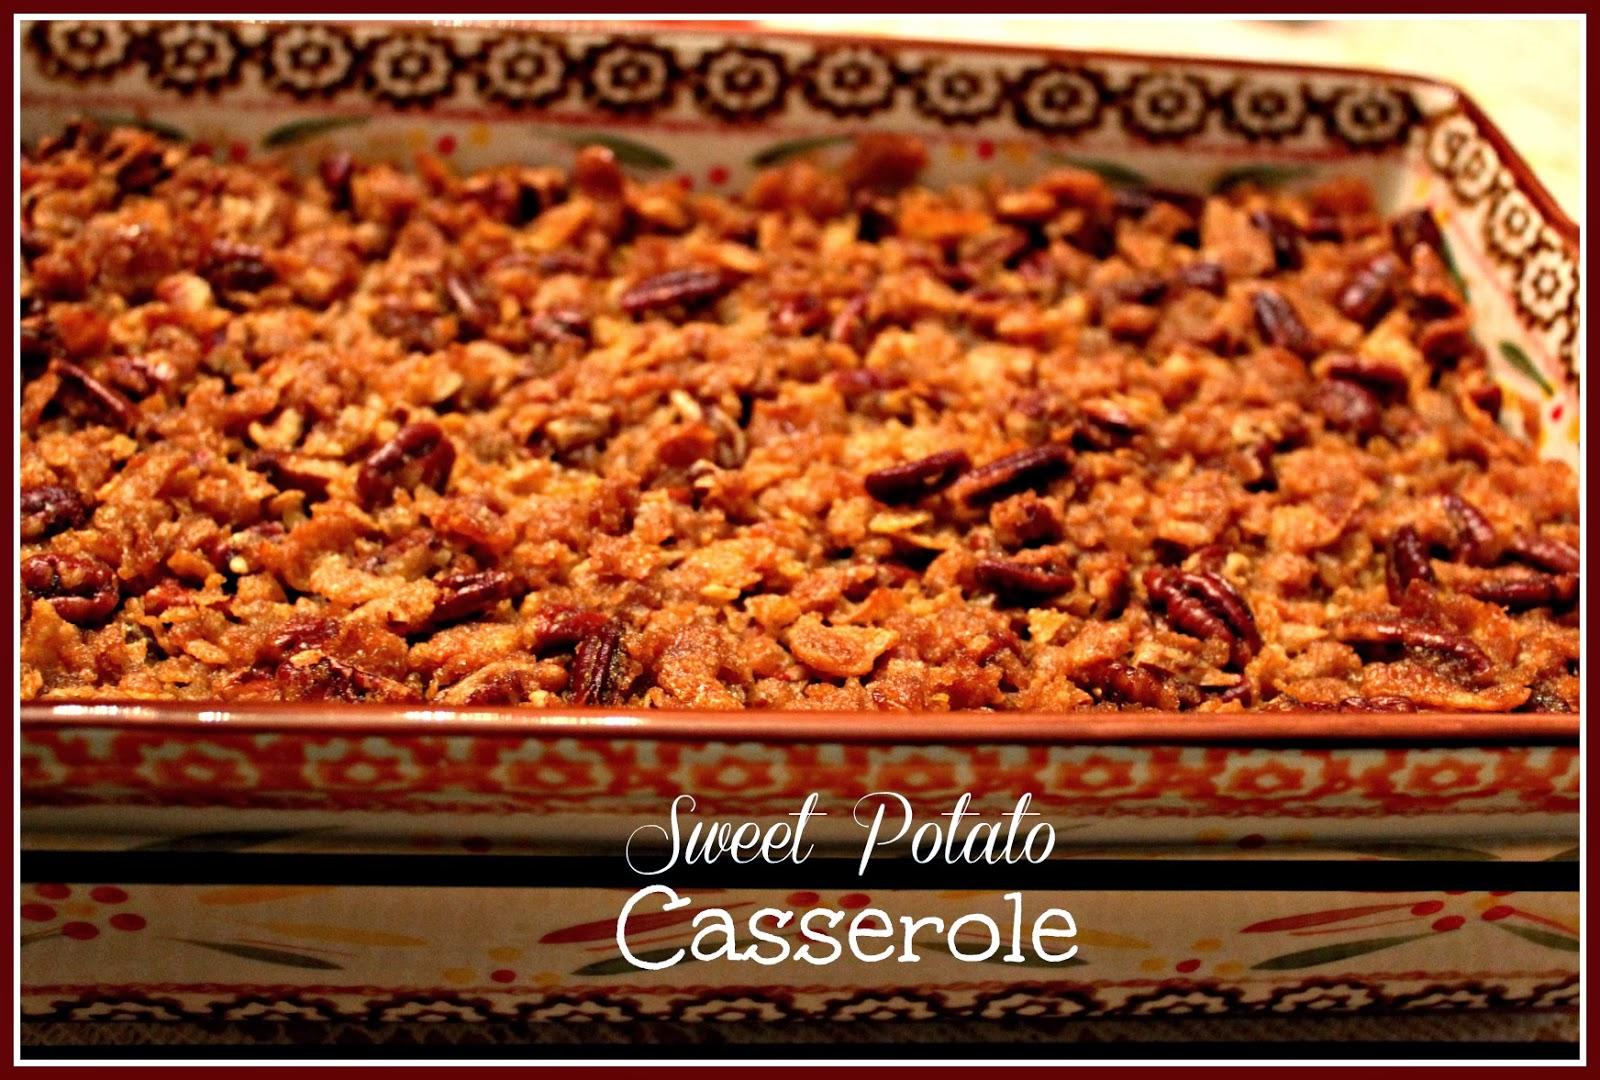 Sweet Potato Casserole!